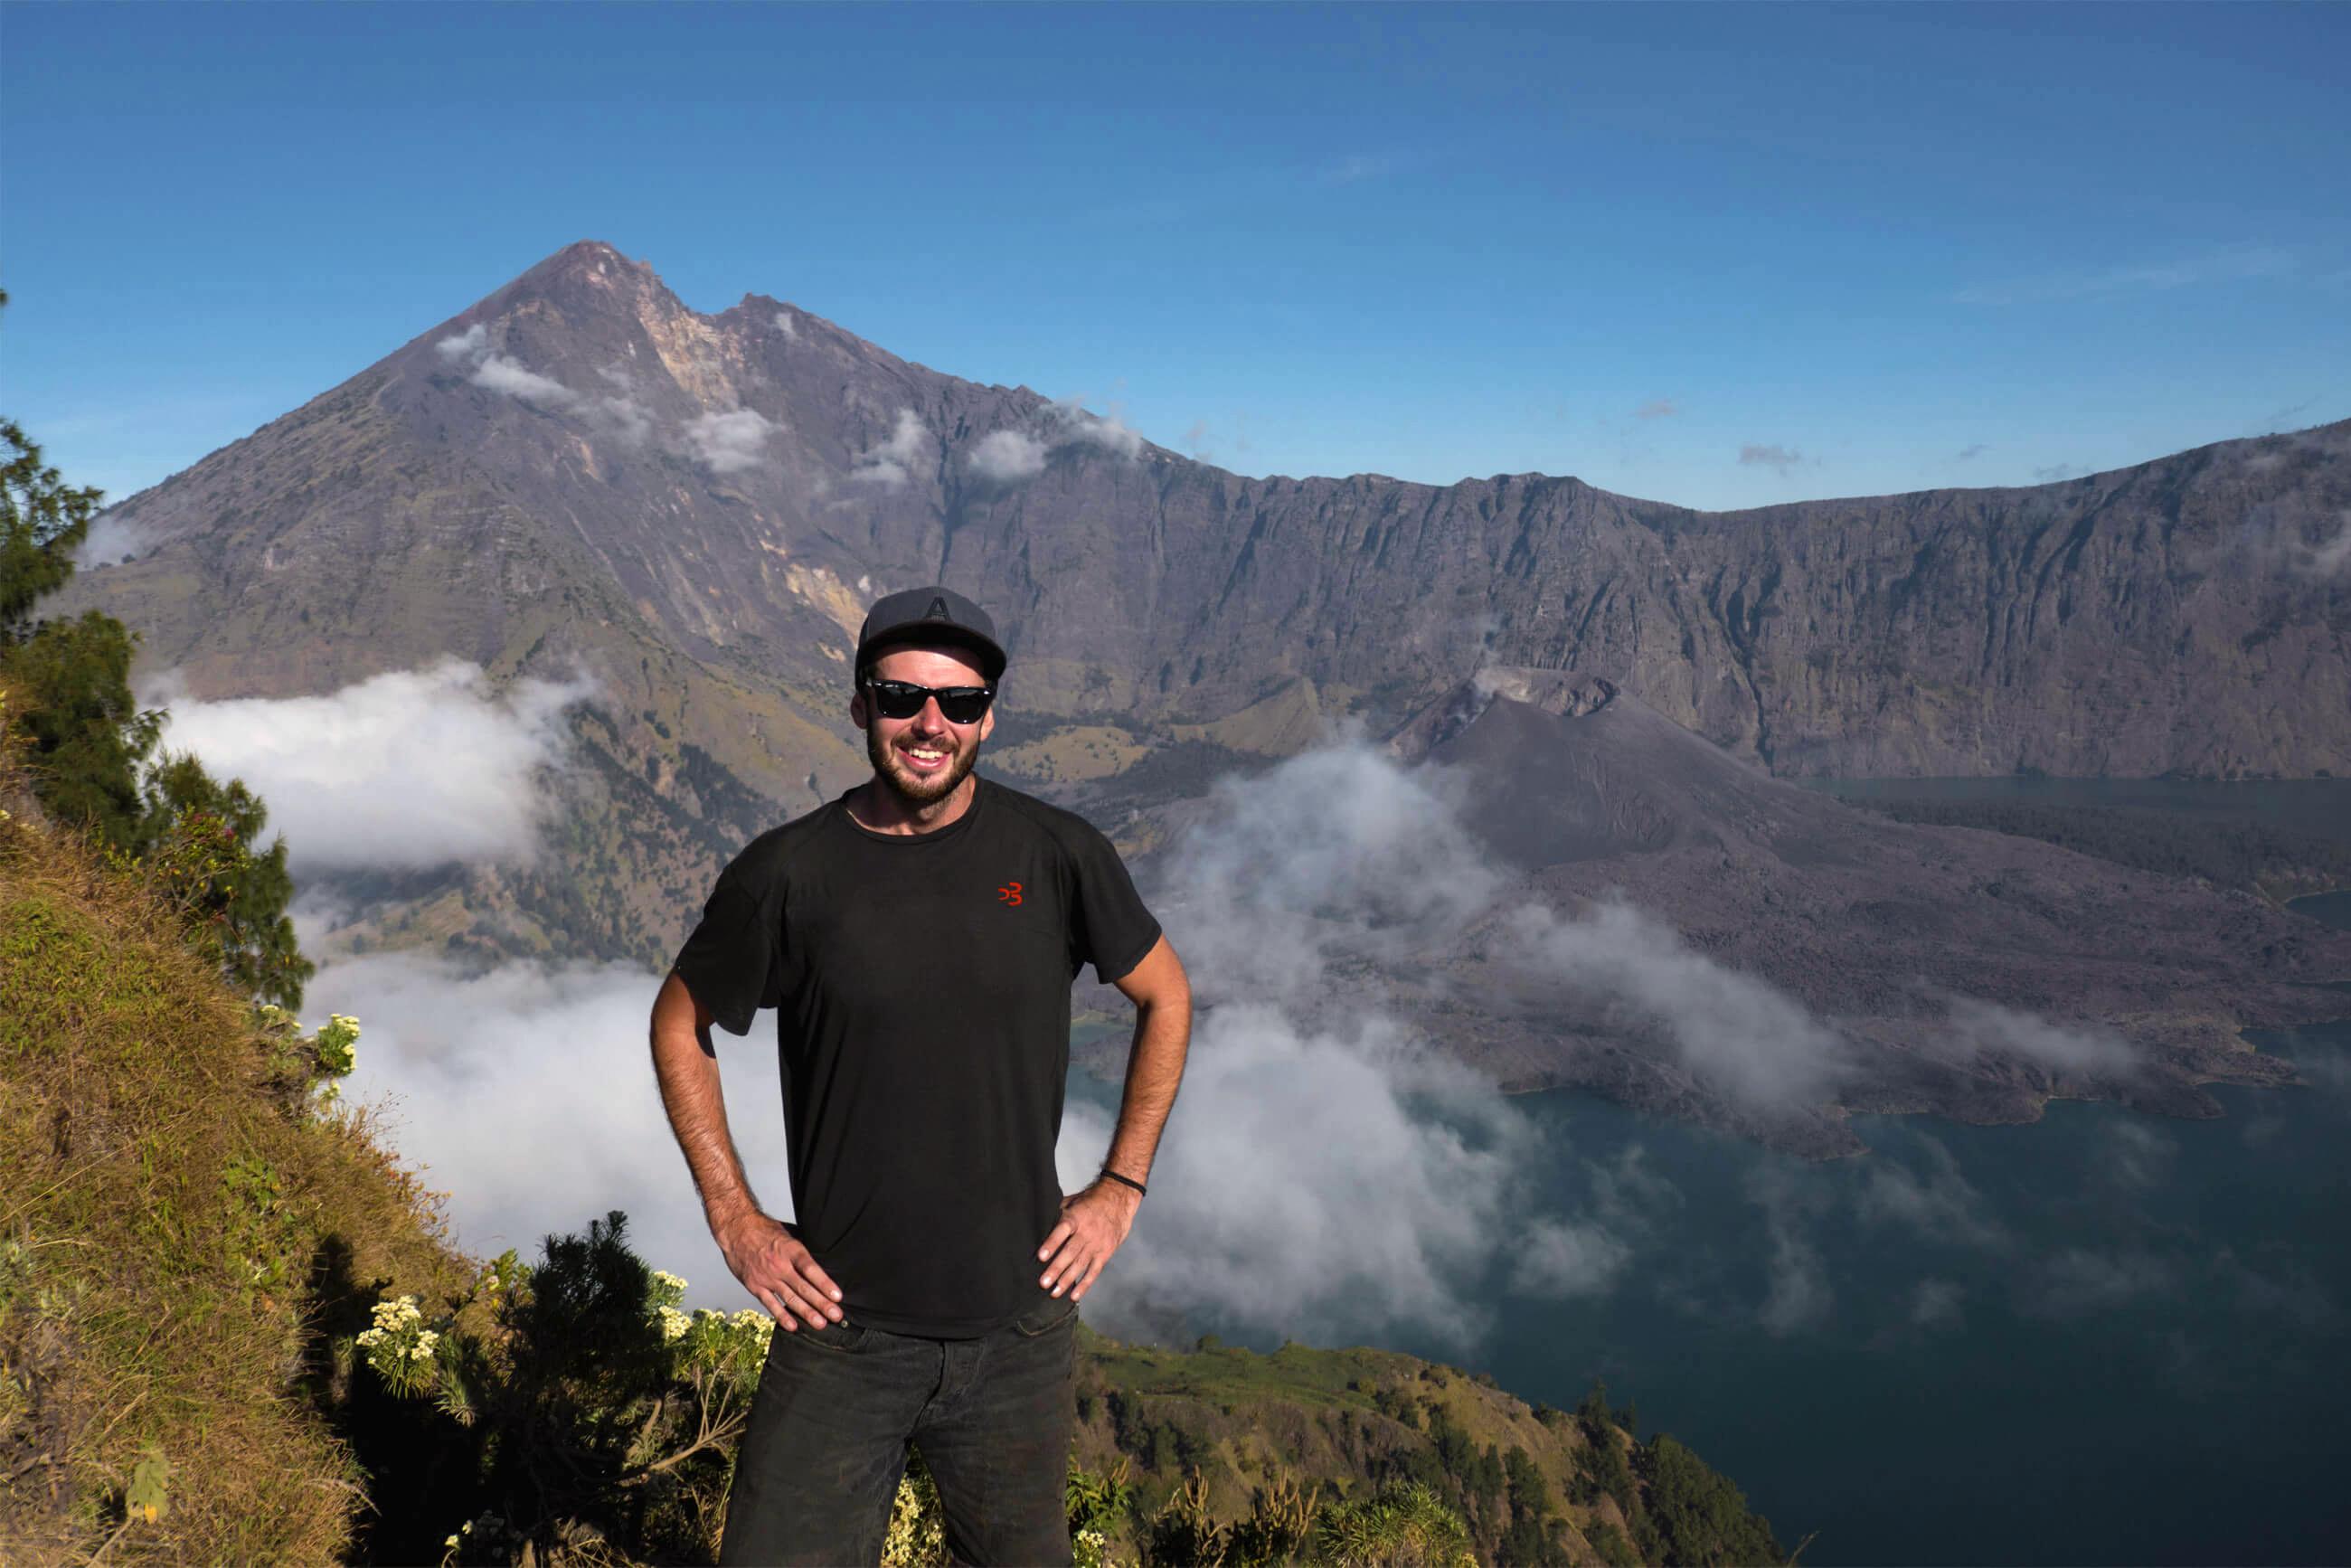 https://bubo.sk/uploads/galleries/7308/martinsimko_indonezia_klf_p1060316.jpg